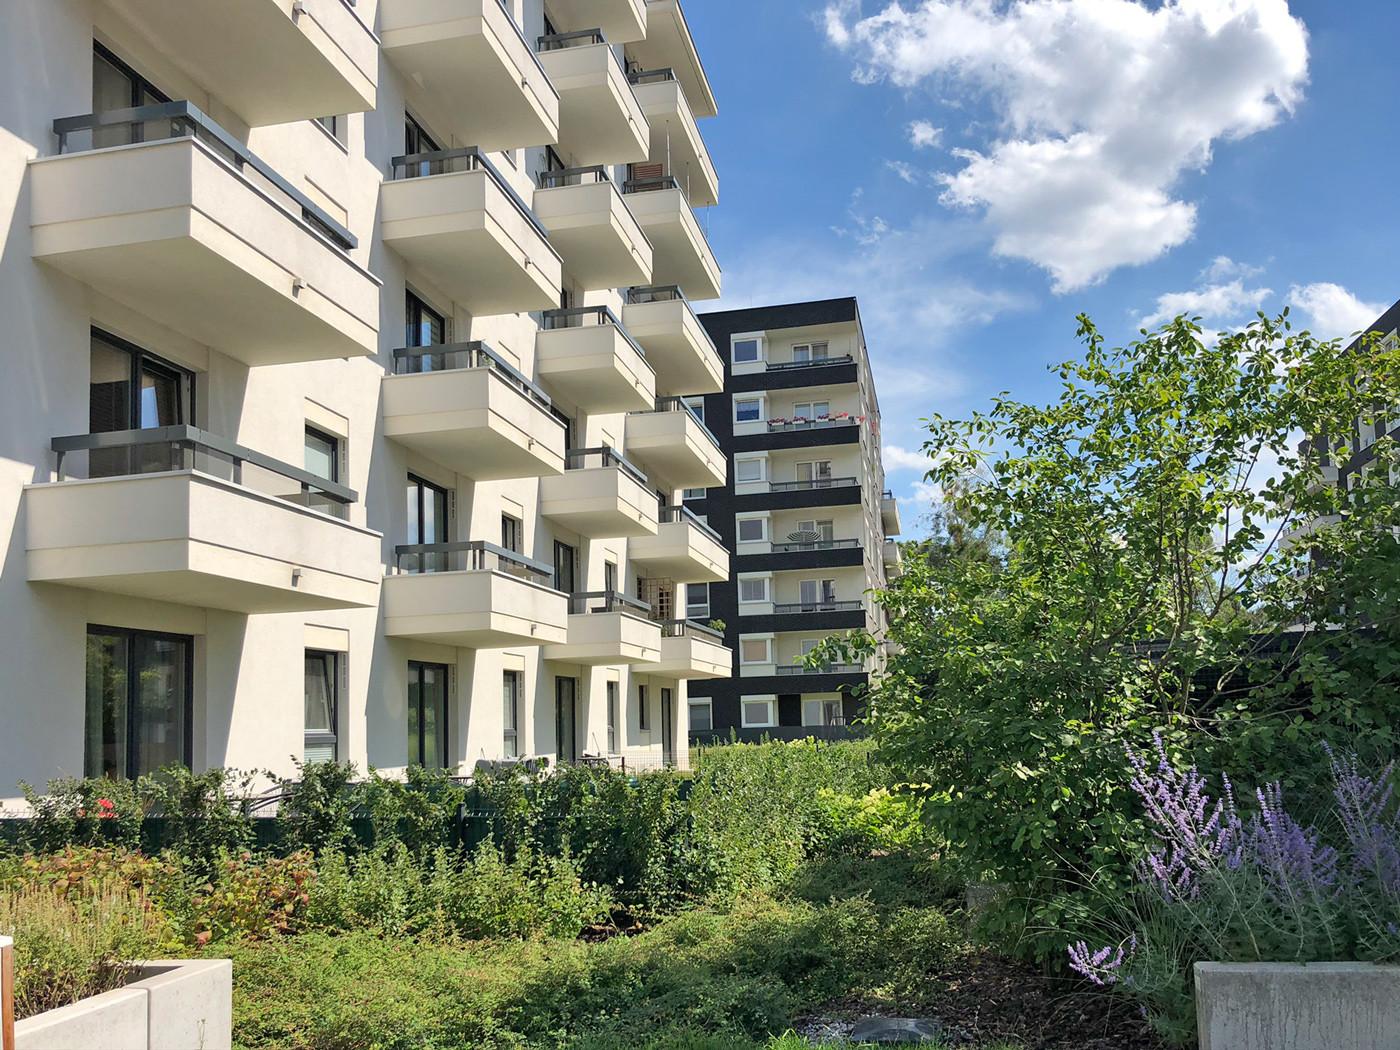 Ursus-Apartments-For-Rent-Warsaw.jpg